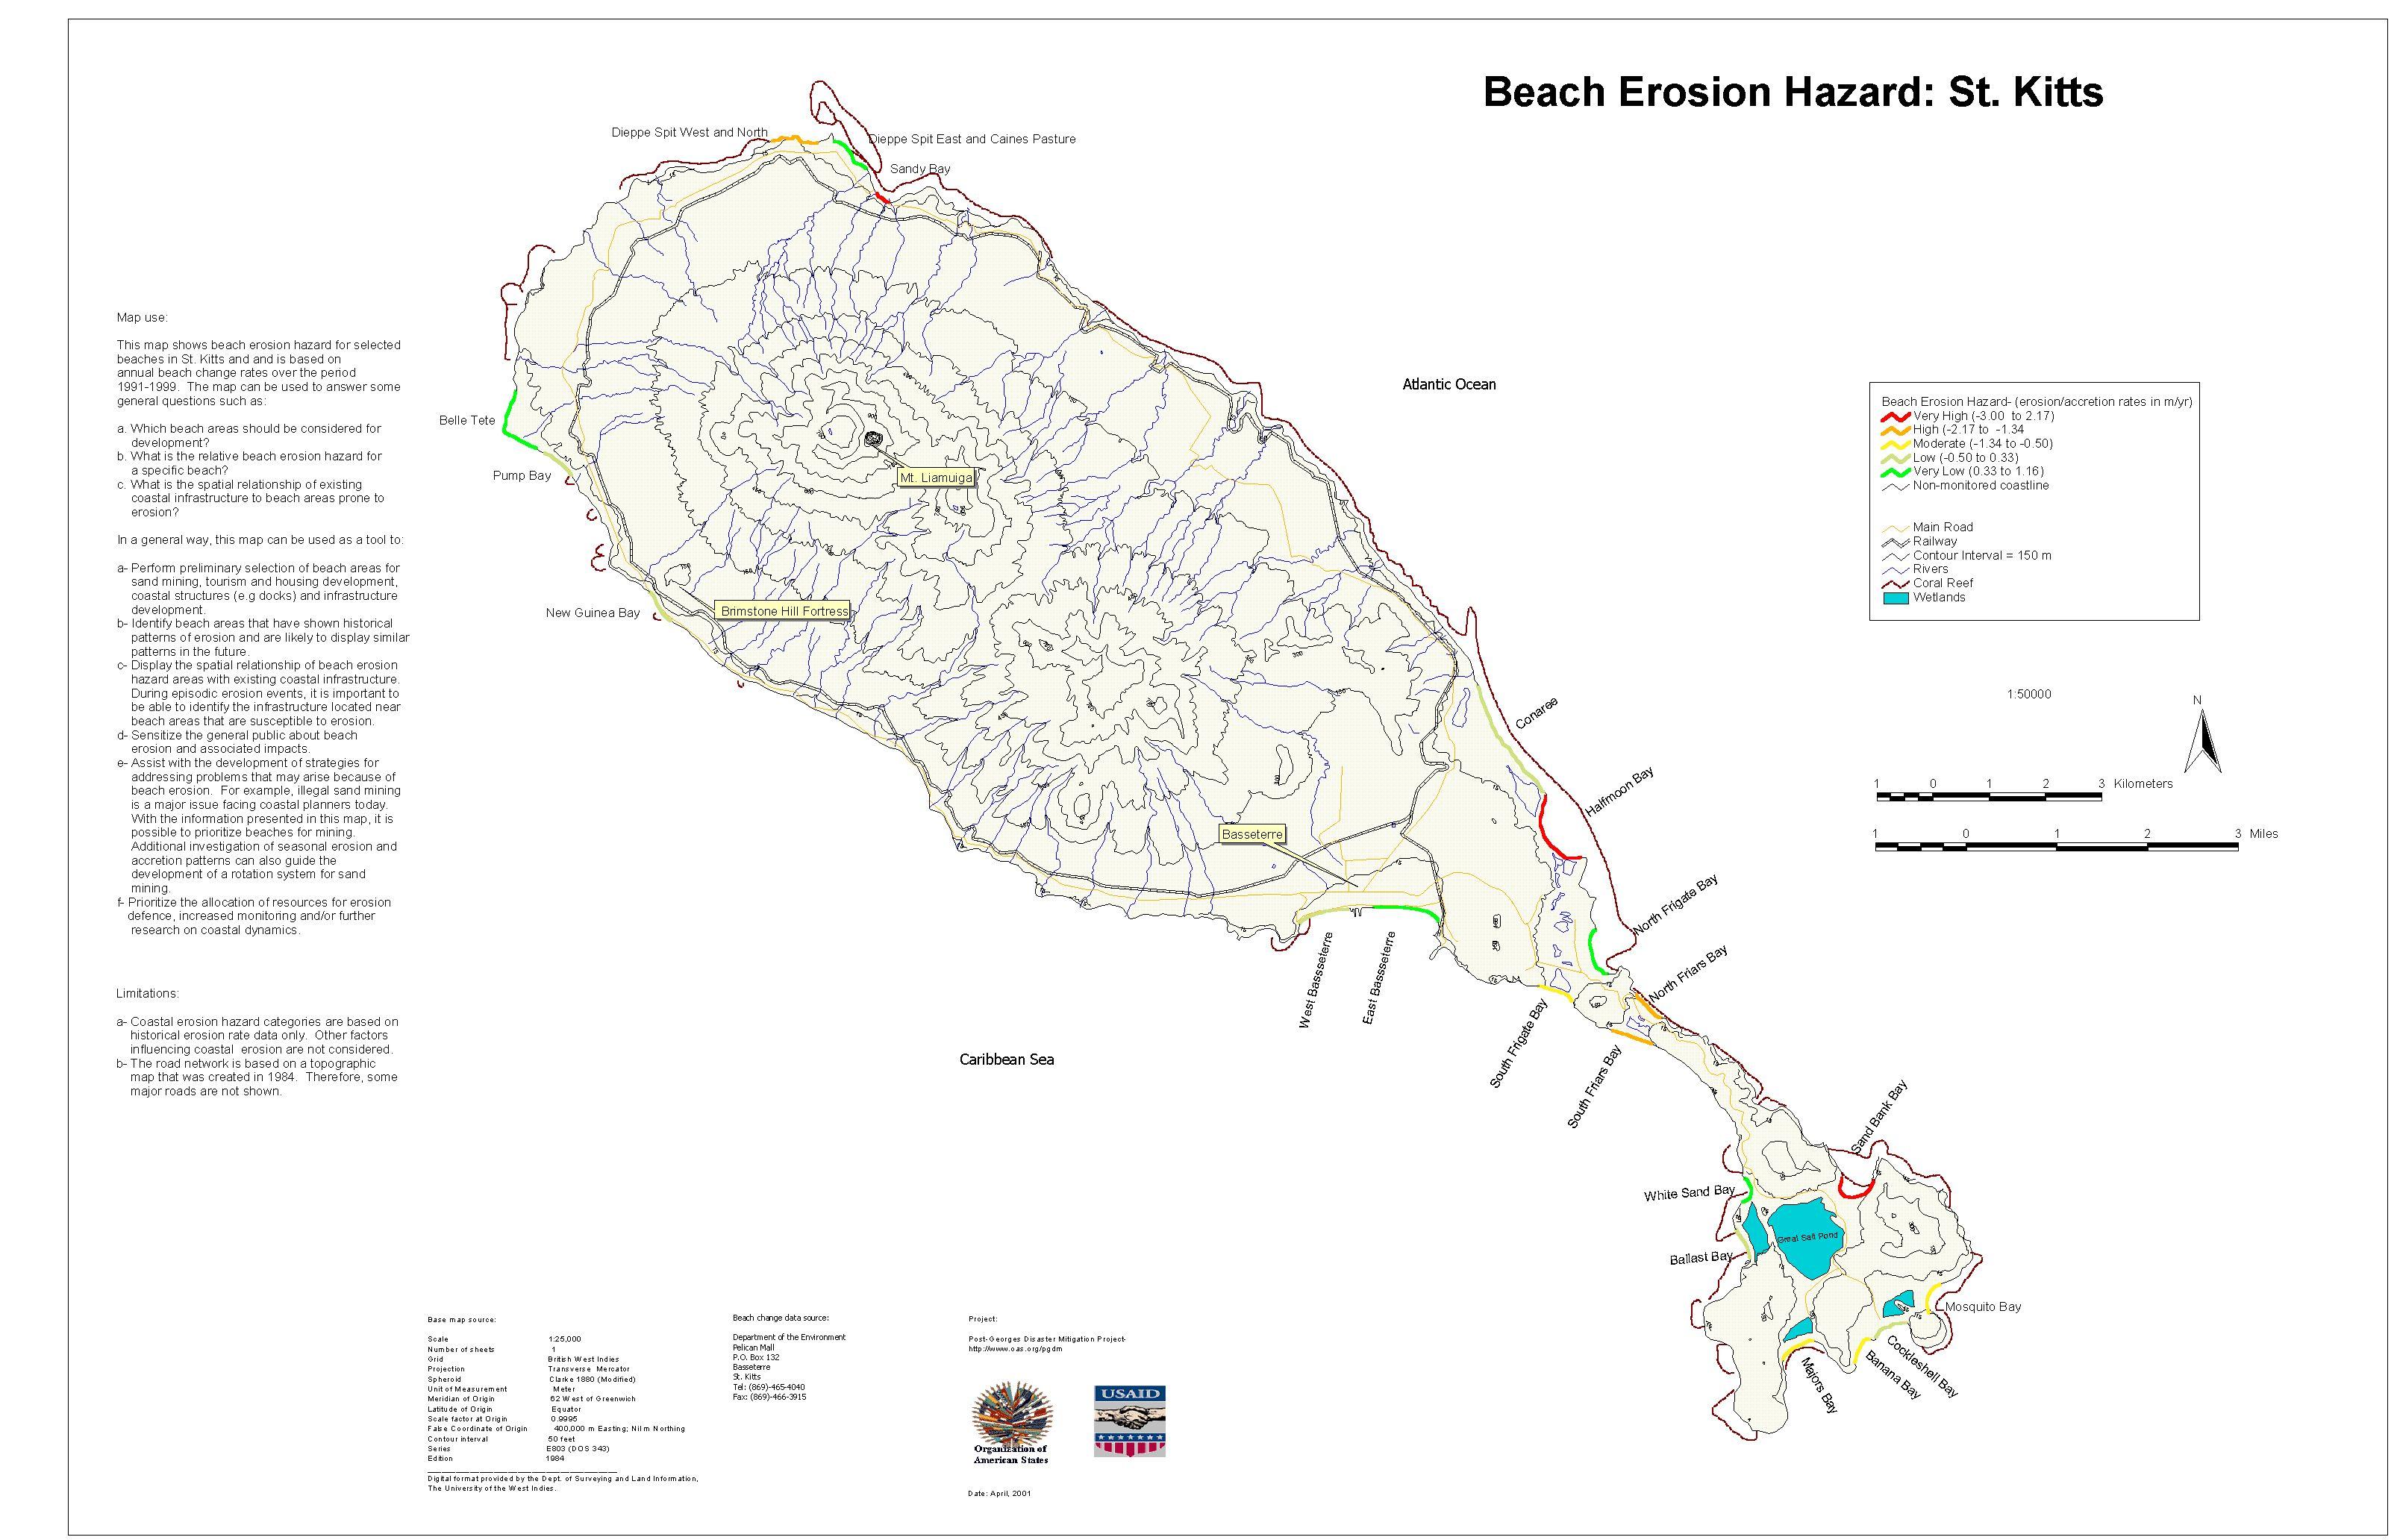 PGDM Beach Erosion Hazard Map